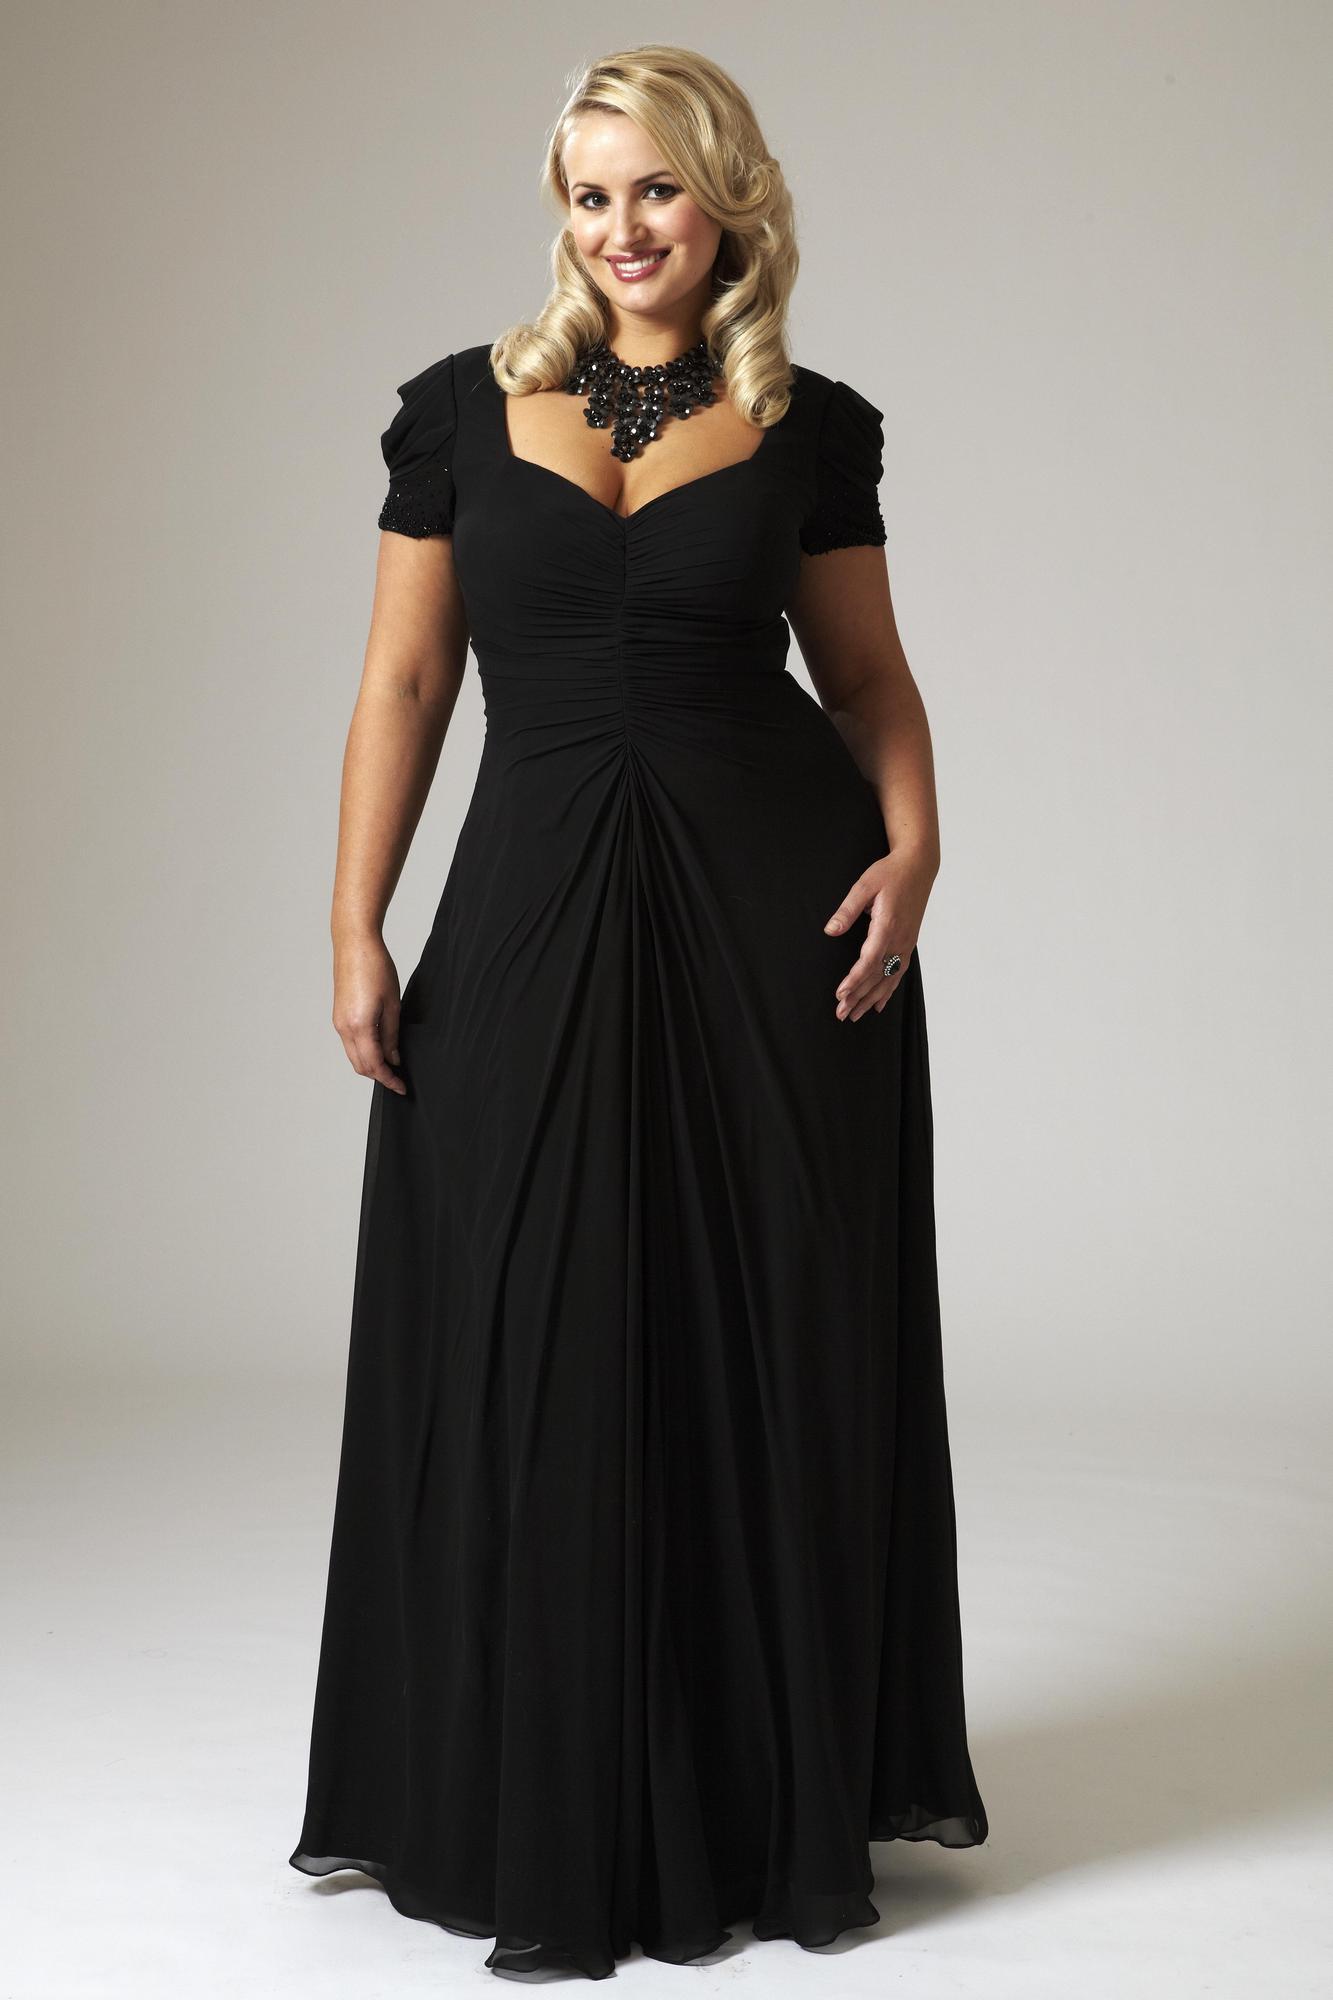 Plus Size Formal Dresses | Dressed Up Girl